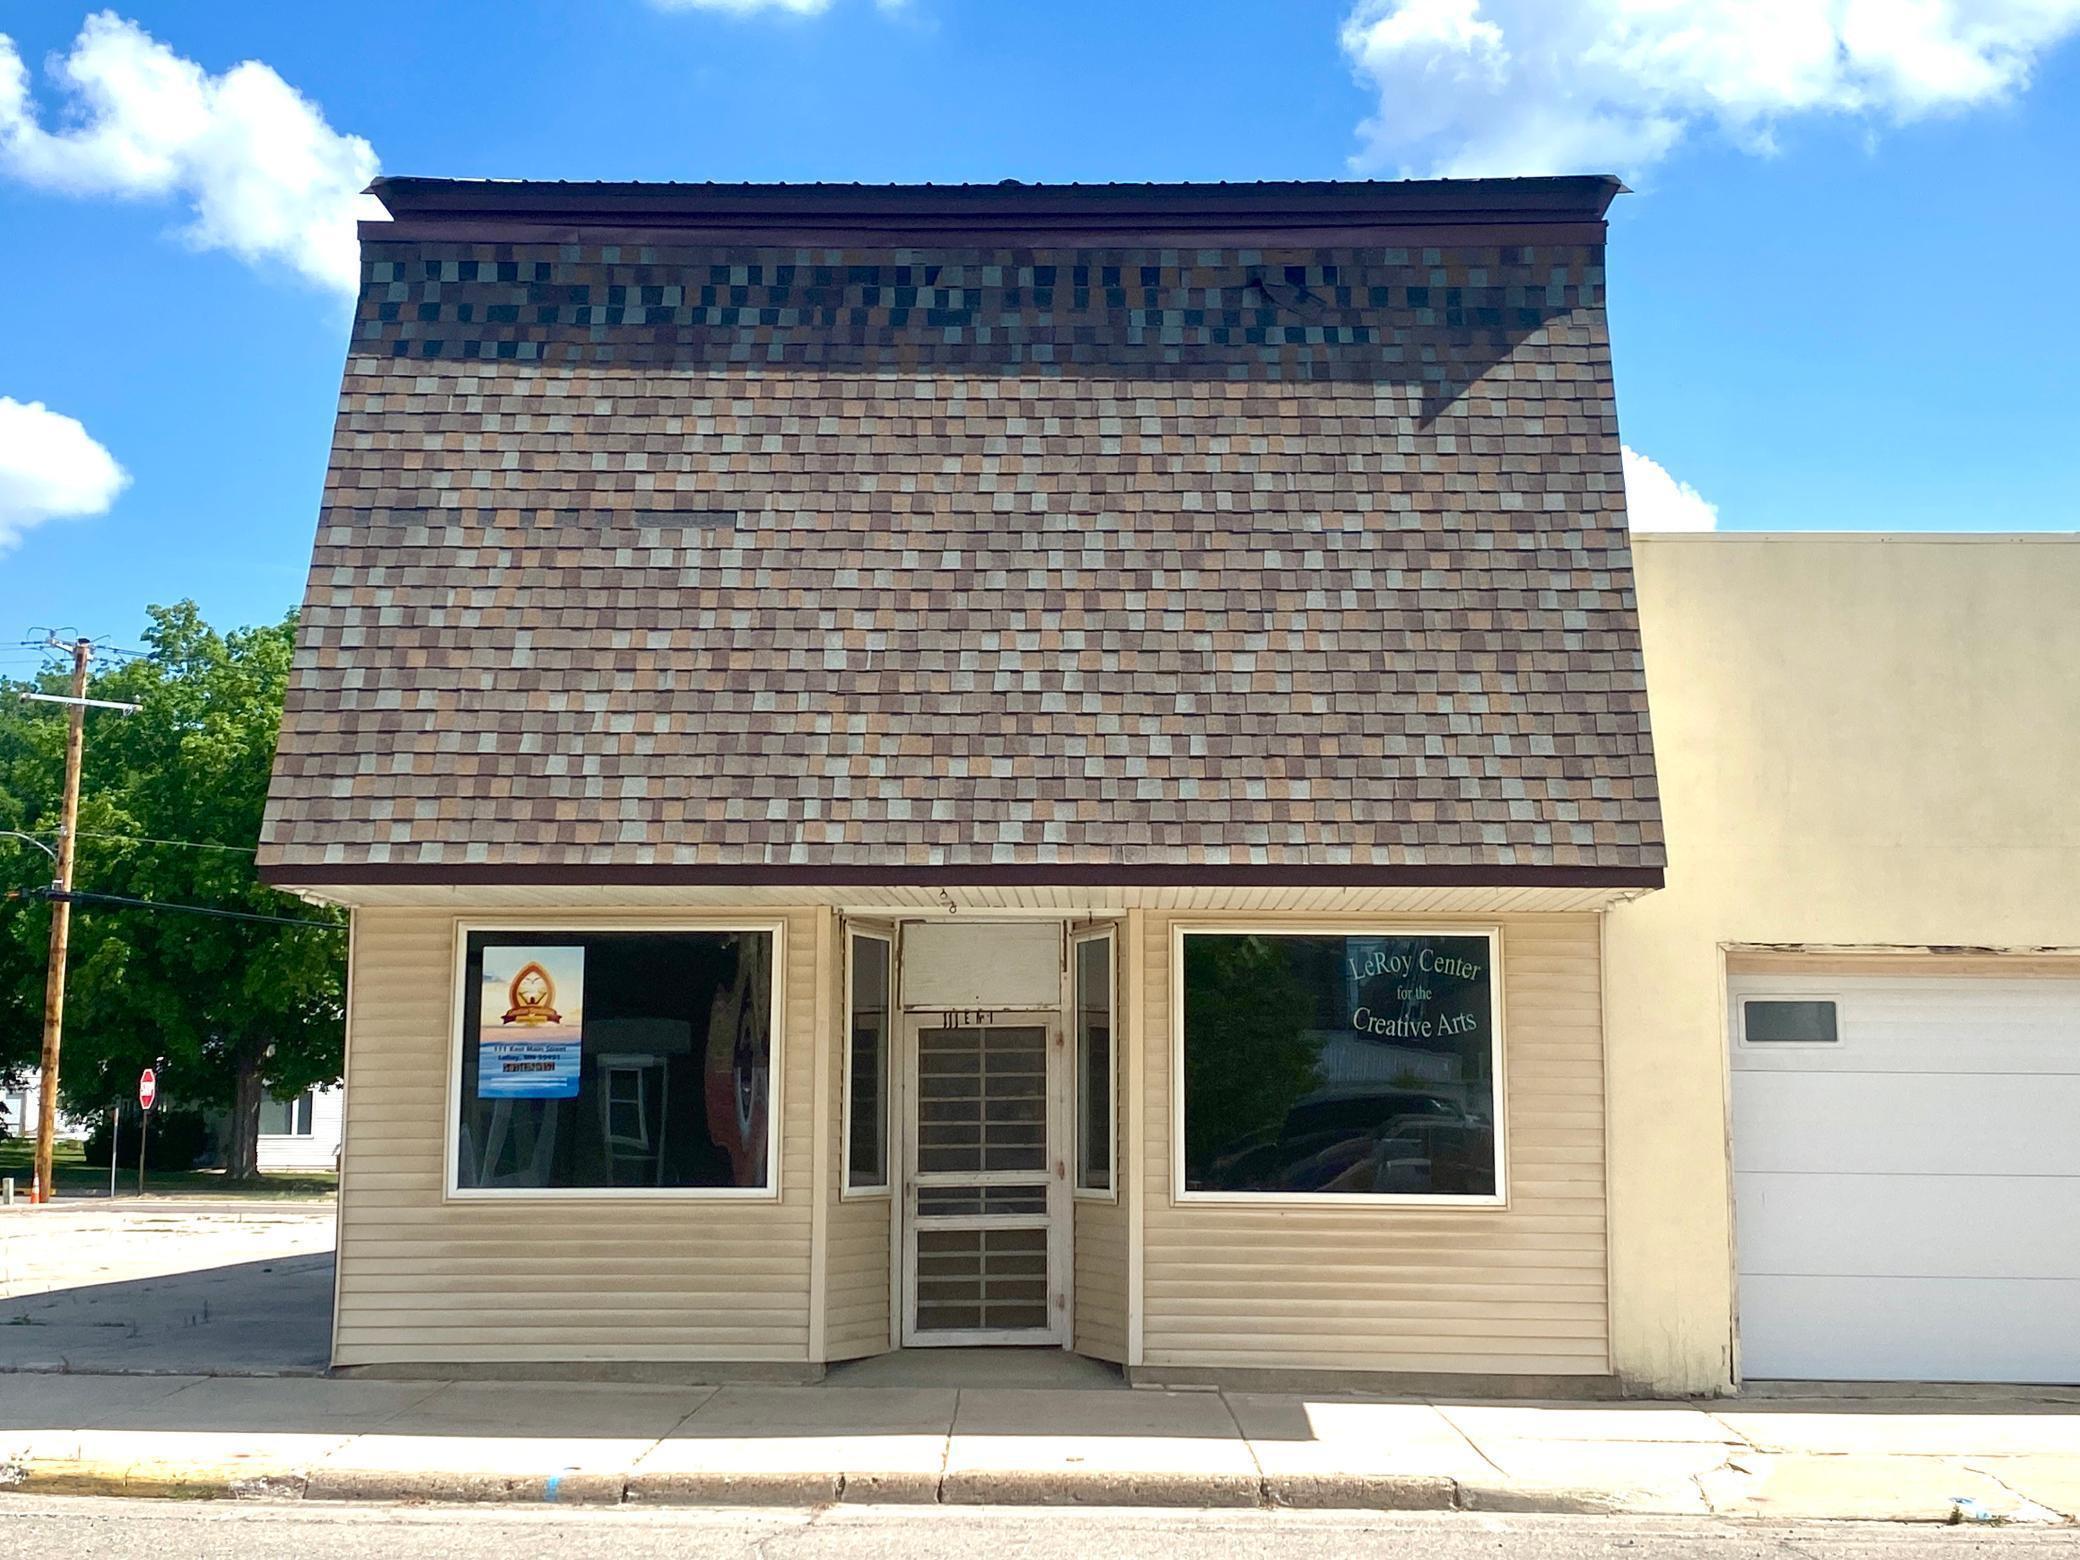 111 E Main Street, MN 55951